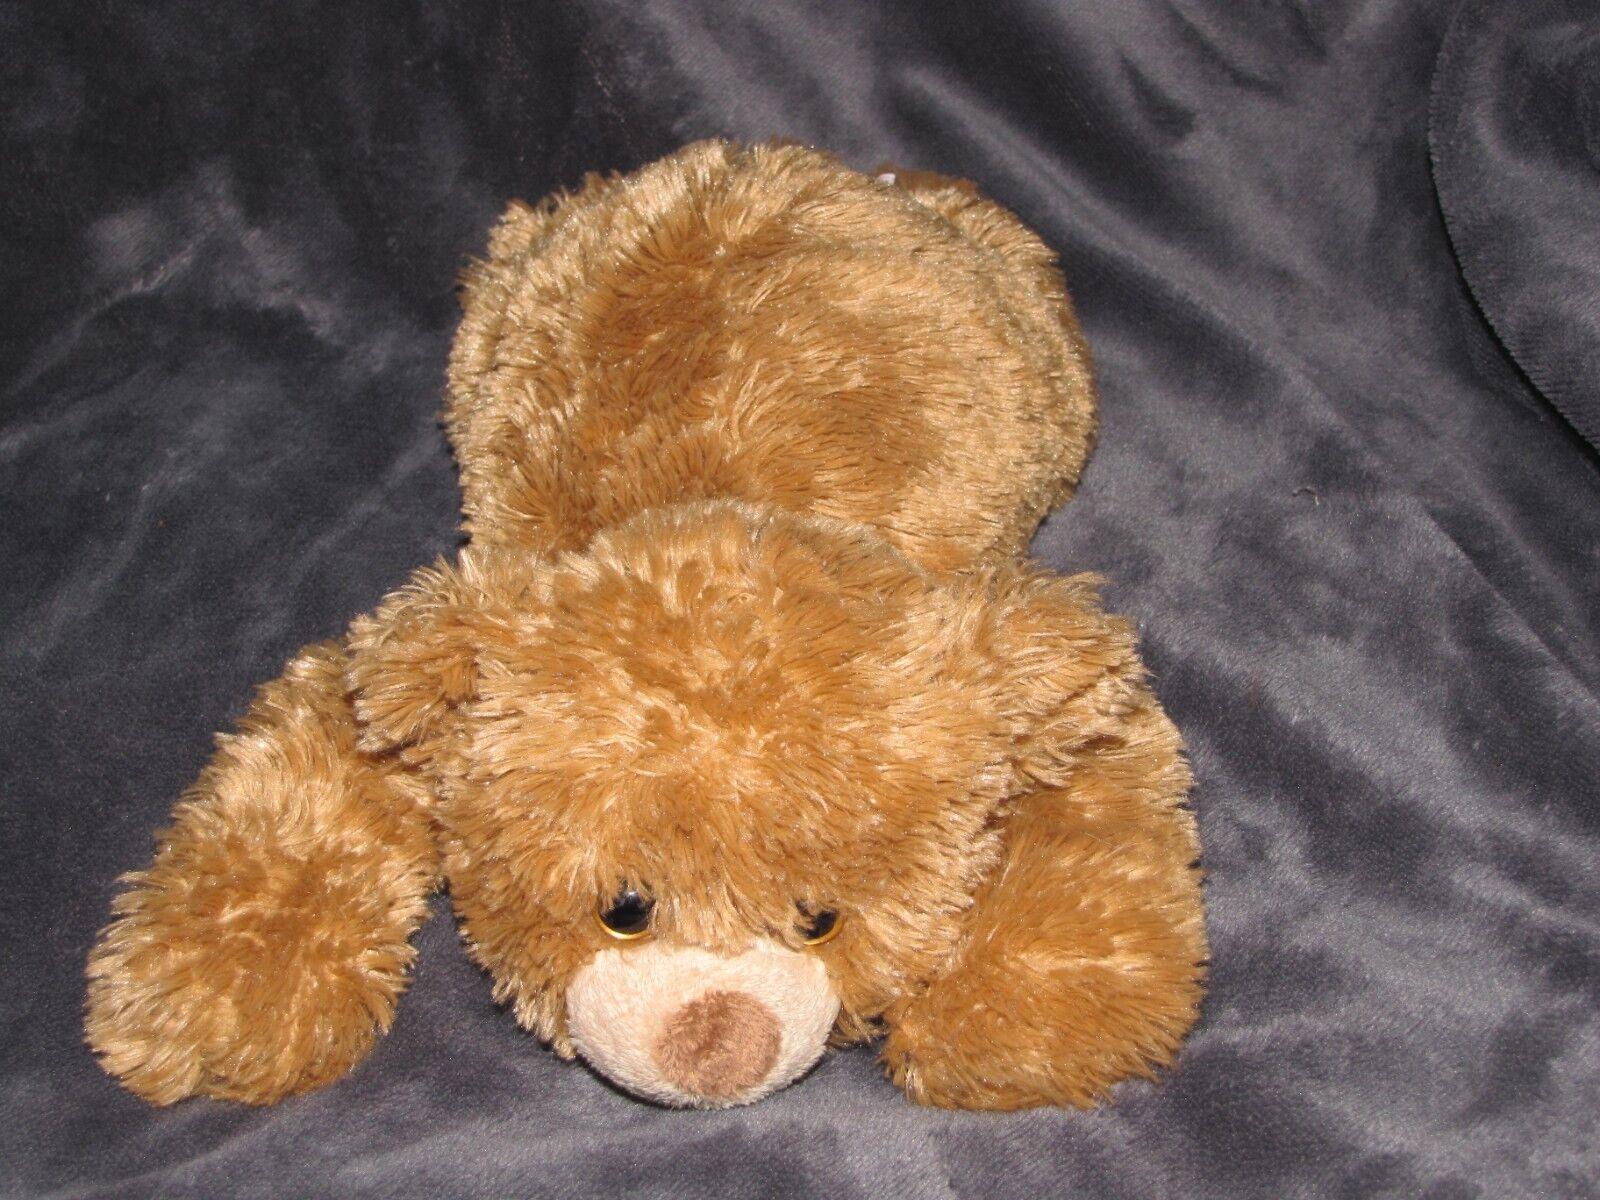 CLASSIC TY LAYING LYING STUFFED PLUSH BROWN TAN goldEN TEDDY BEAR 2011 CHAUCER